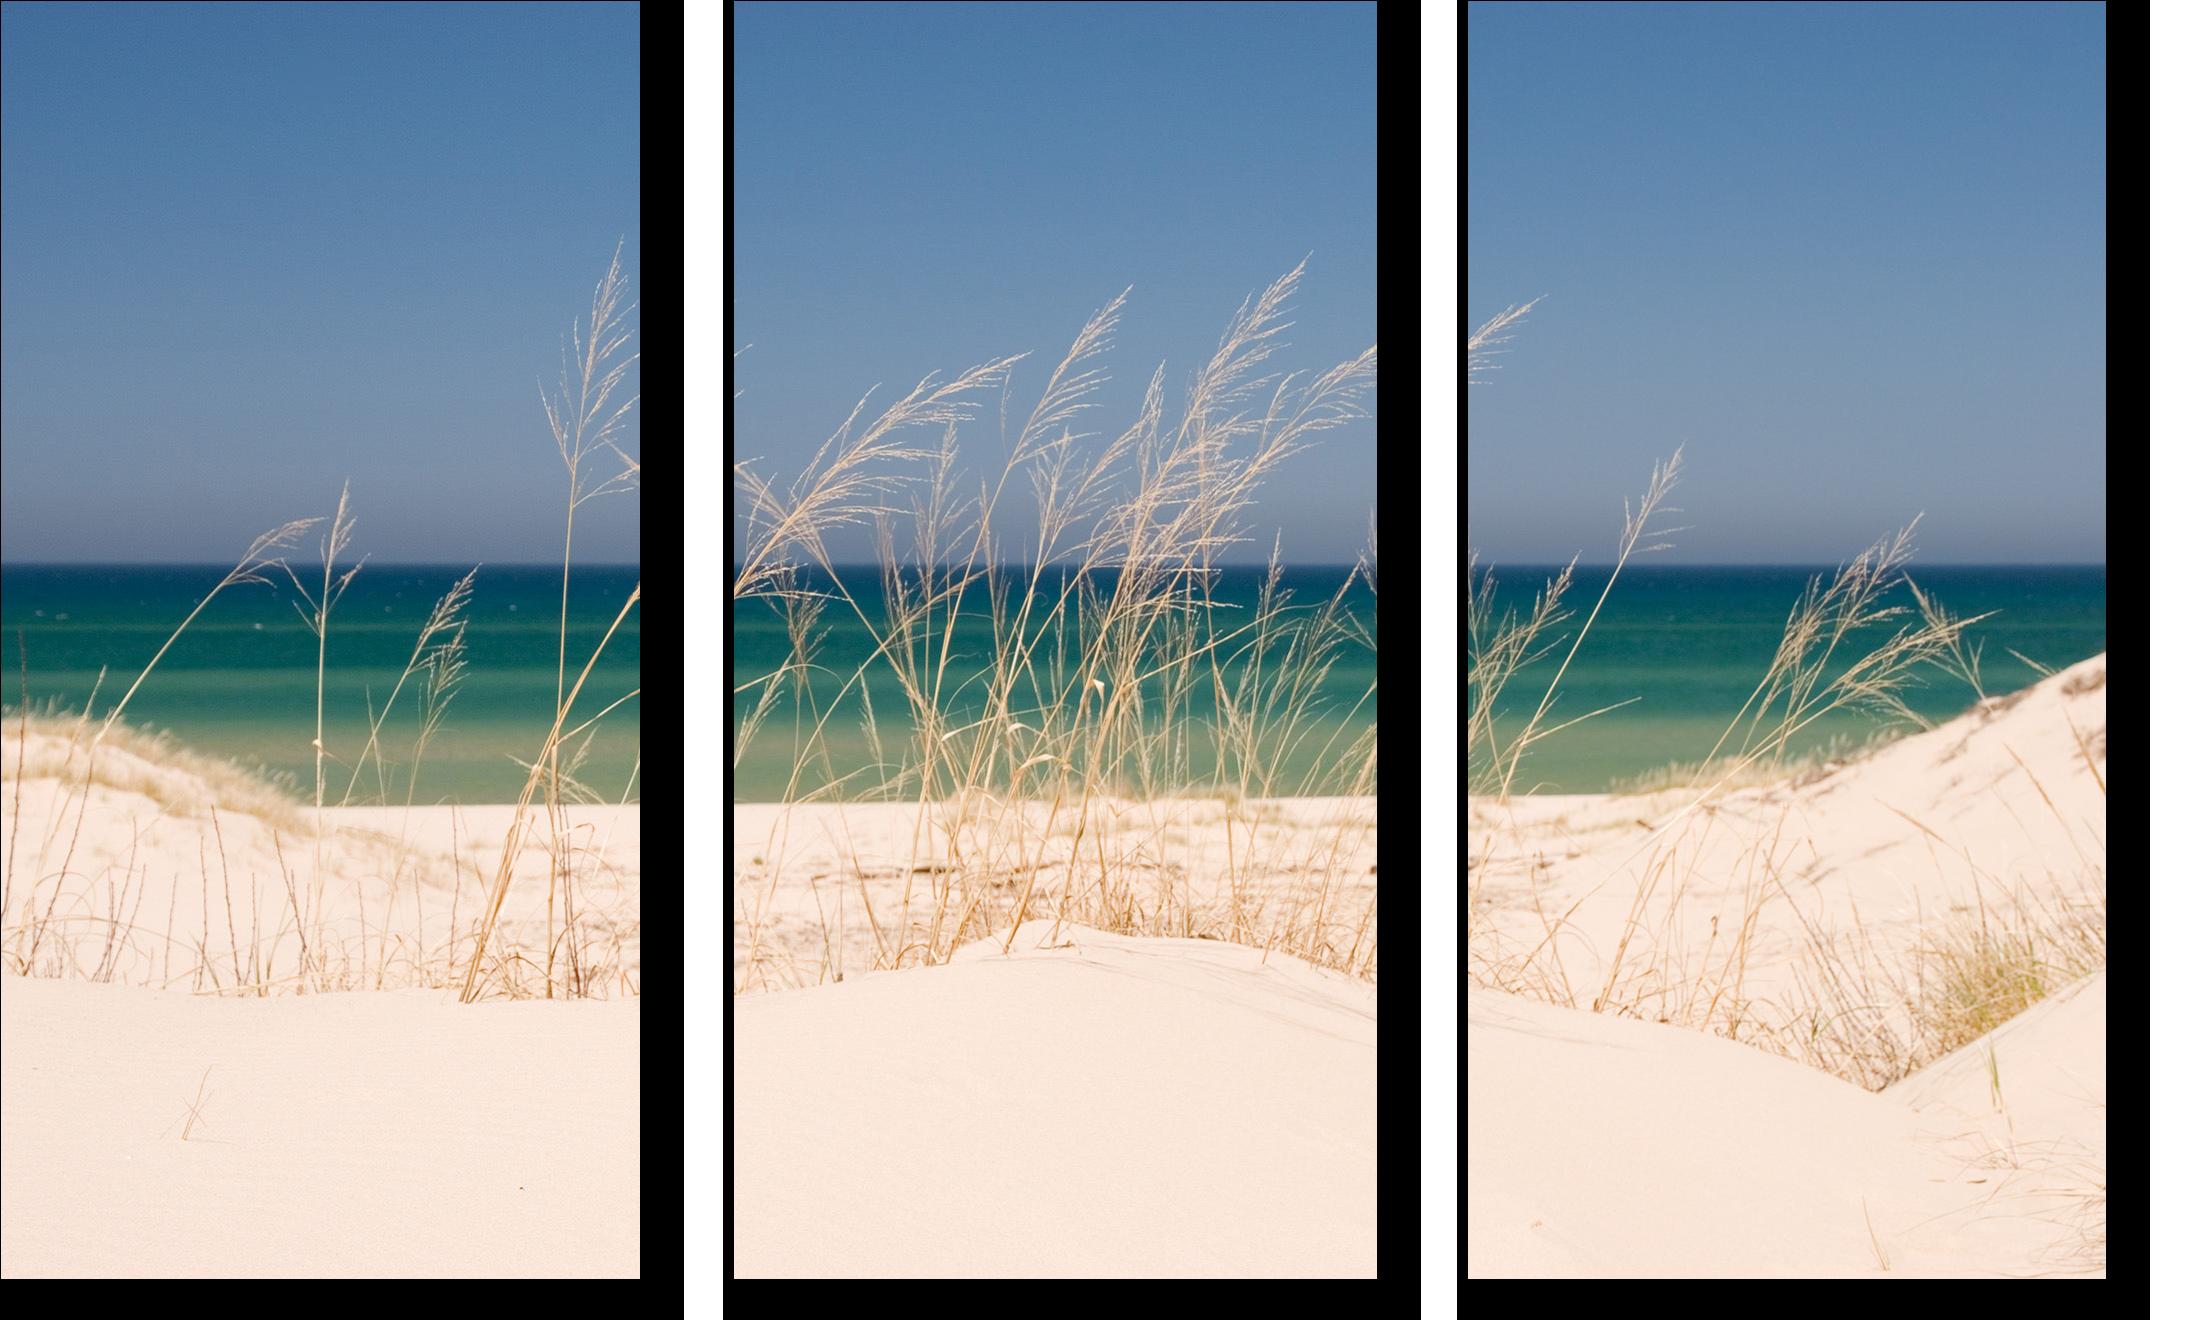 Dune grass and lake michigan tryptich olzdq8